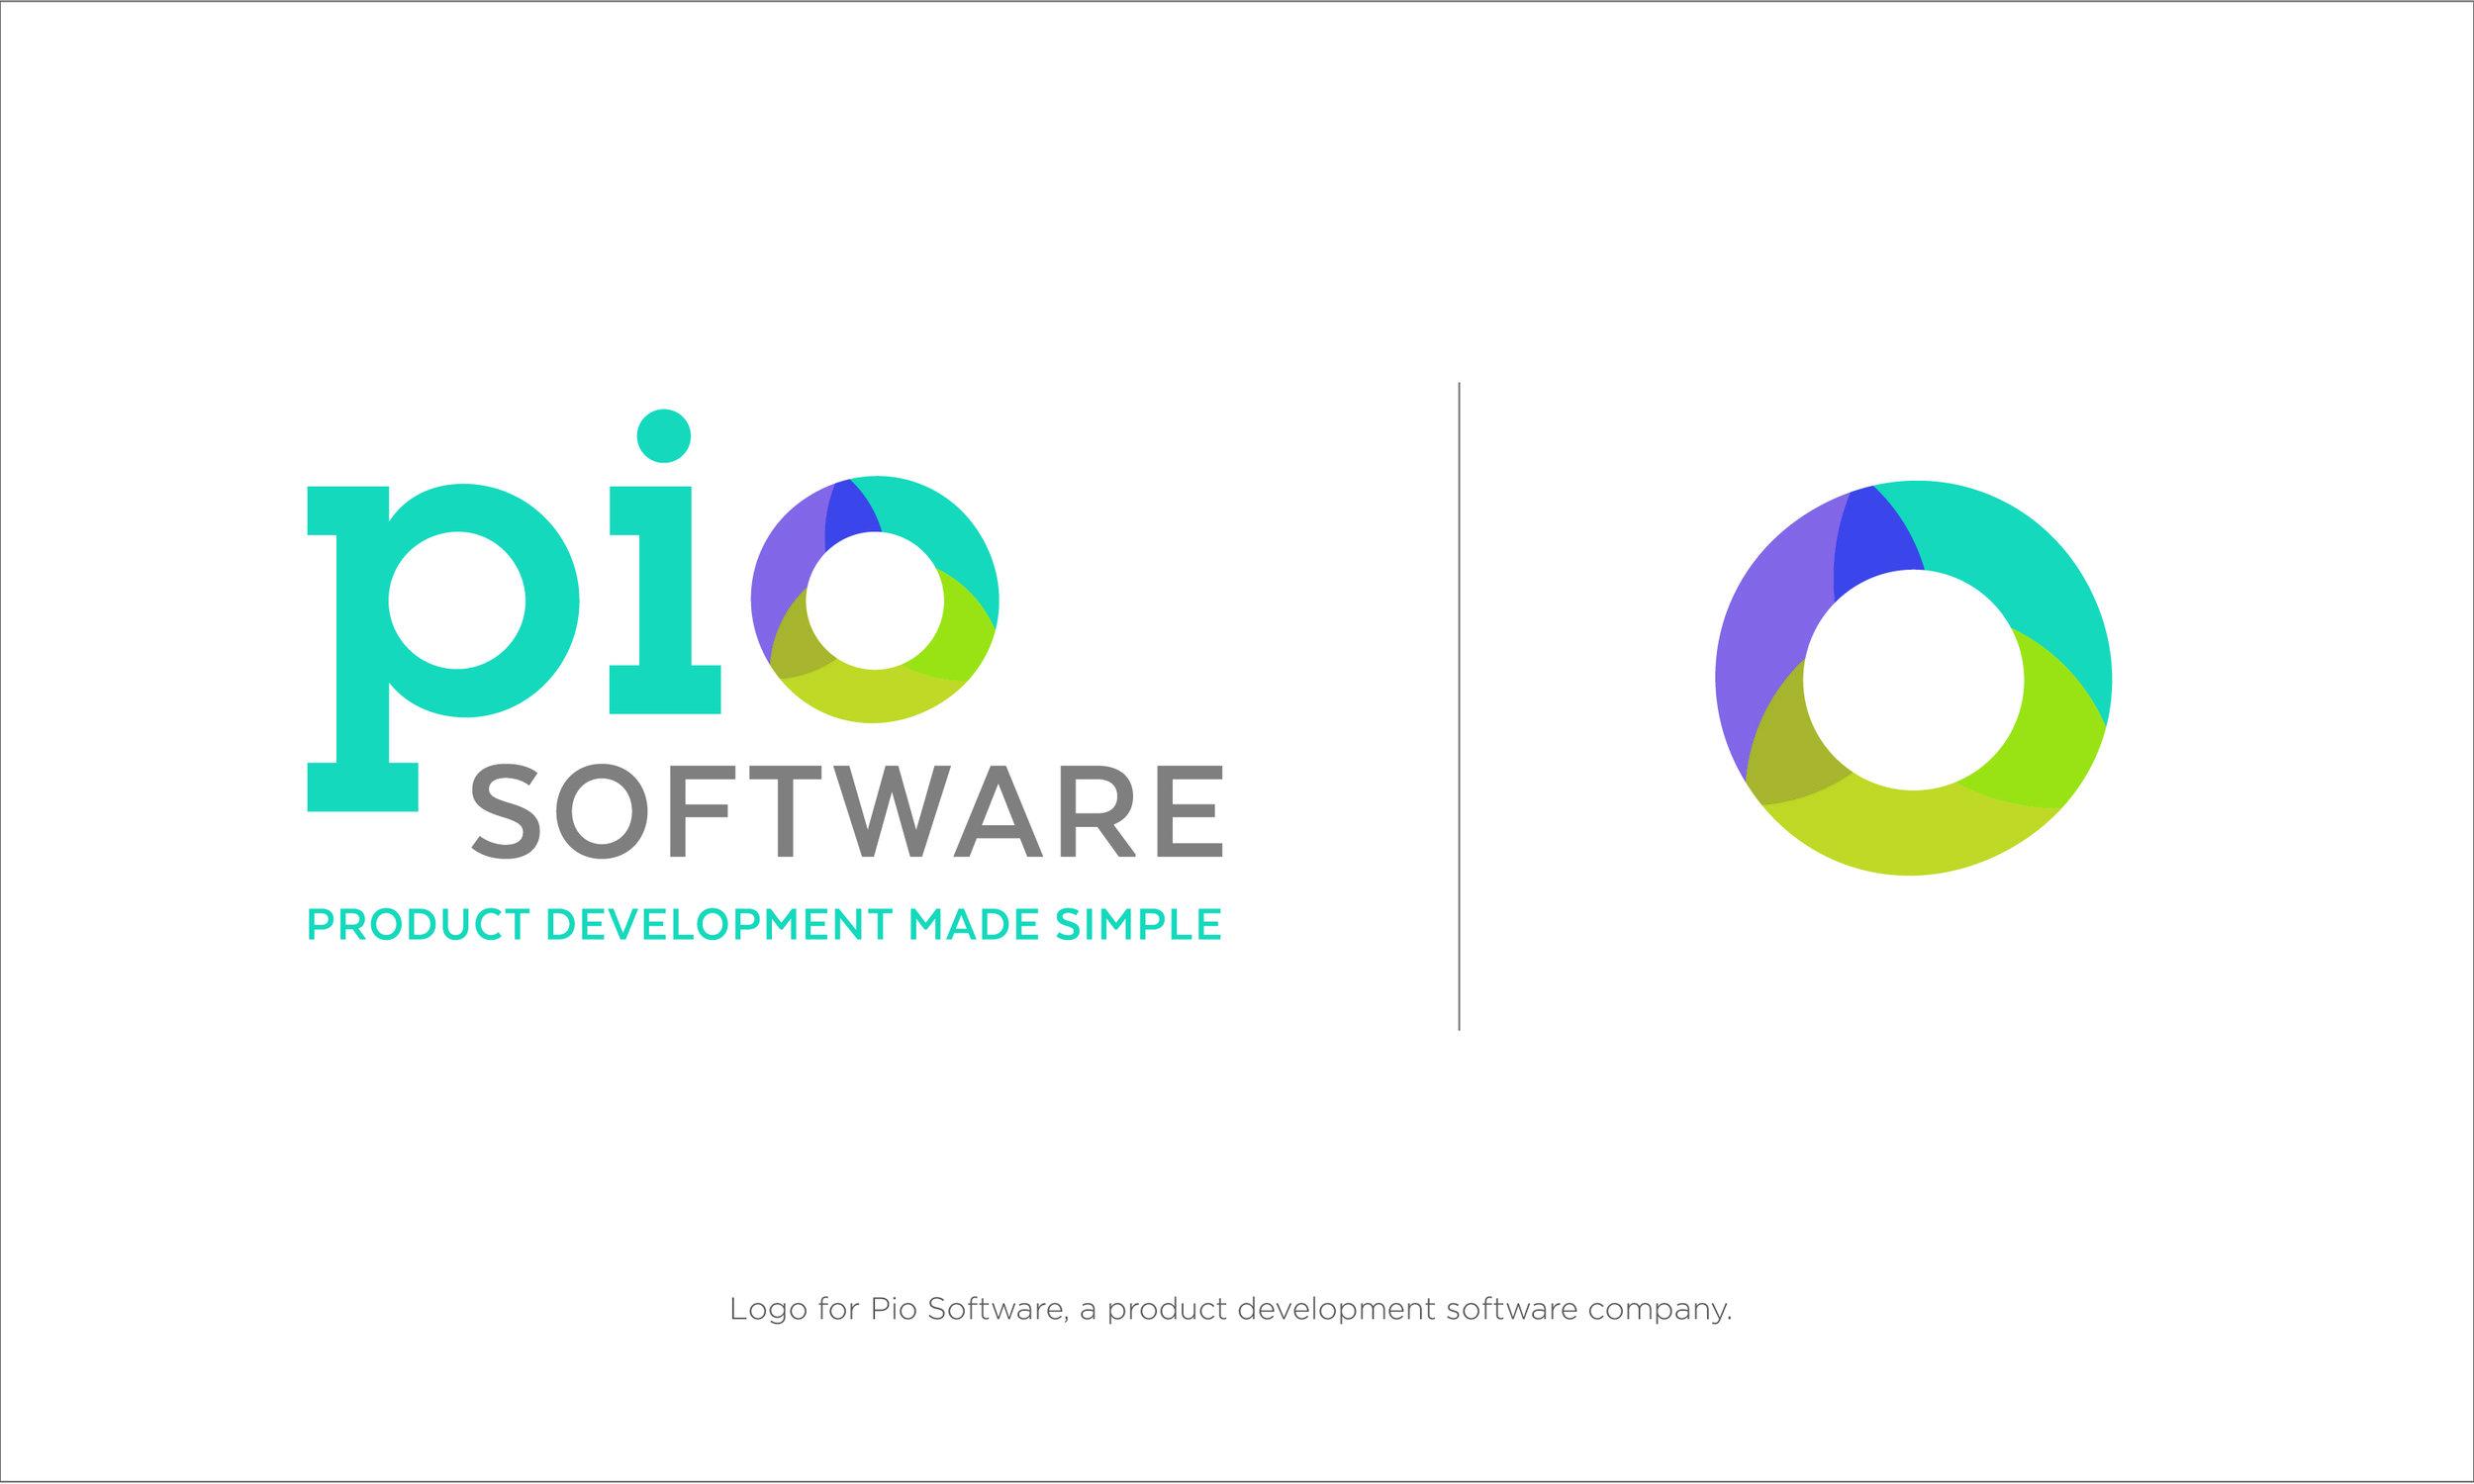 Pio Software